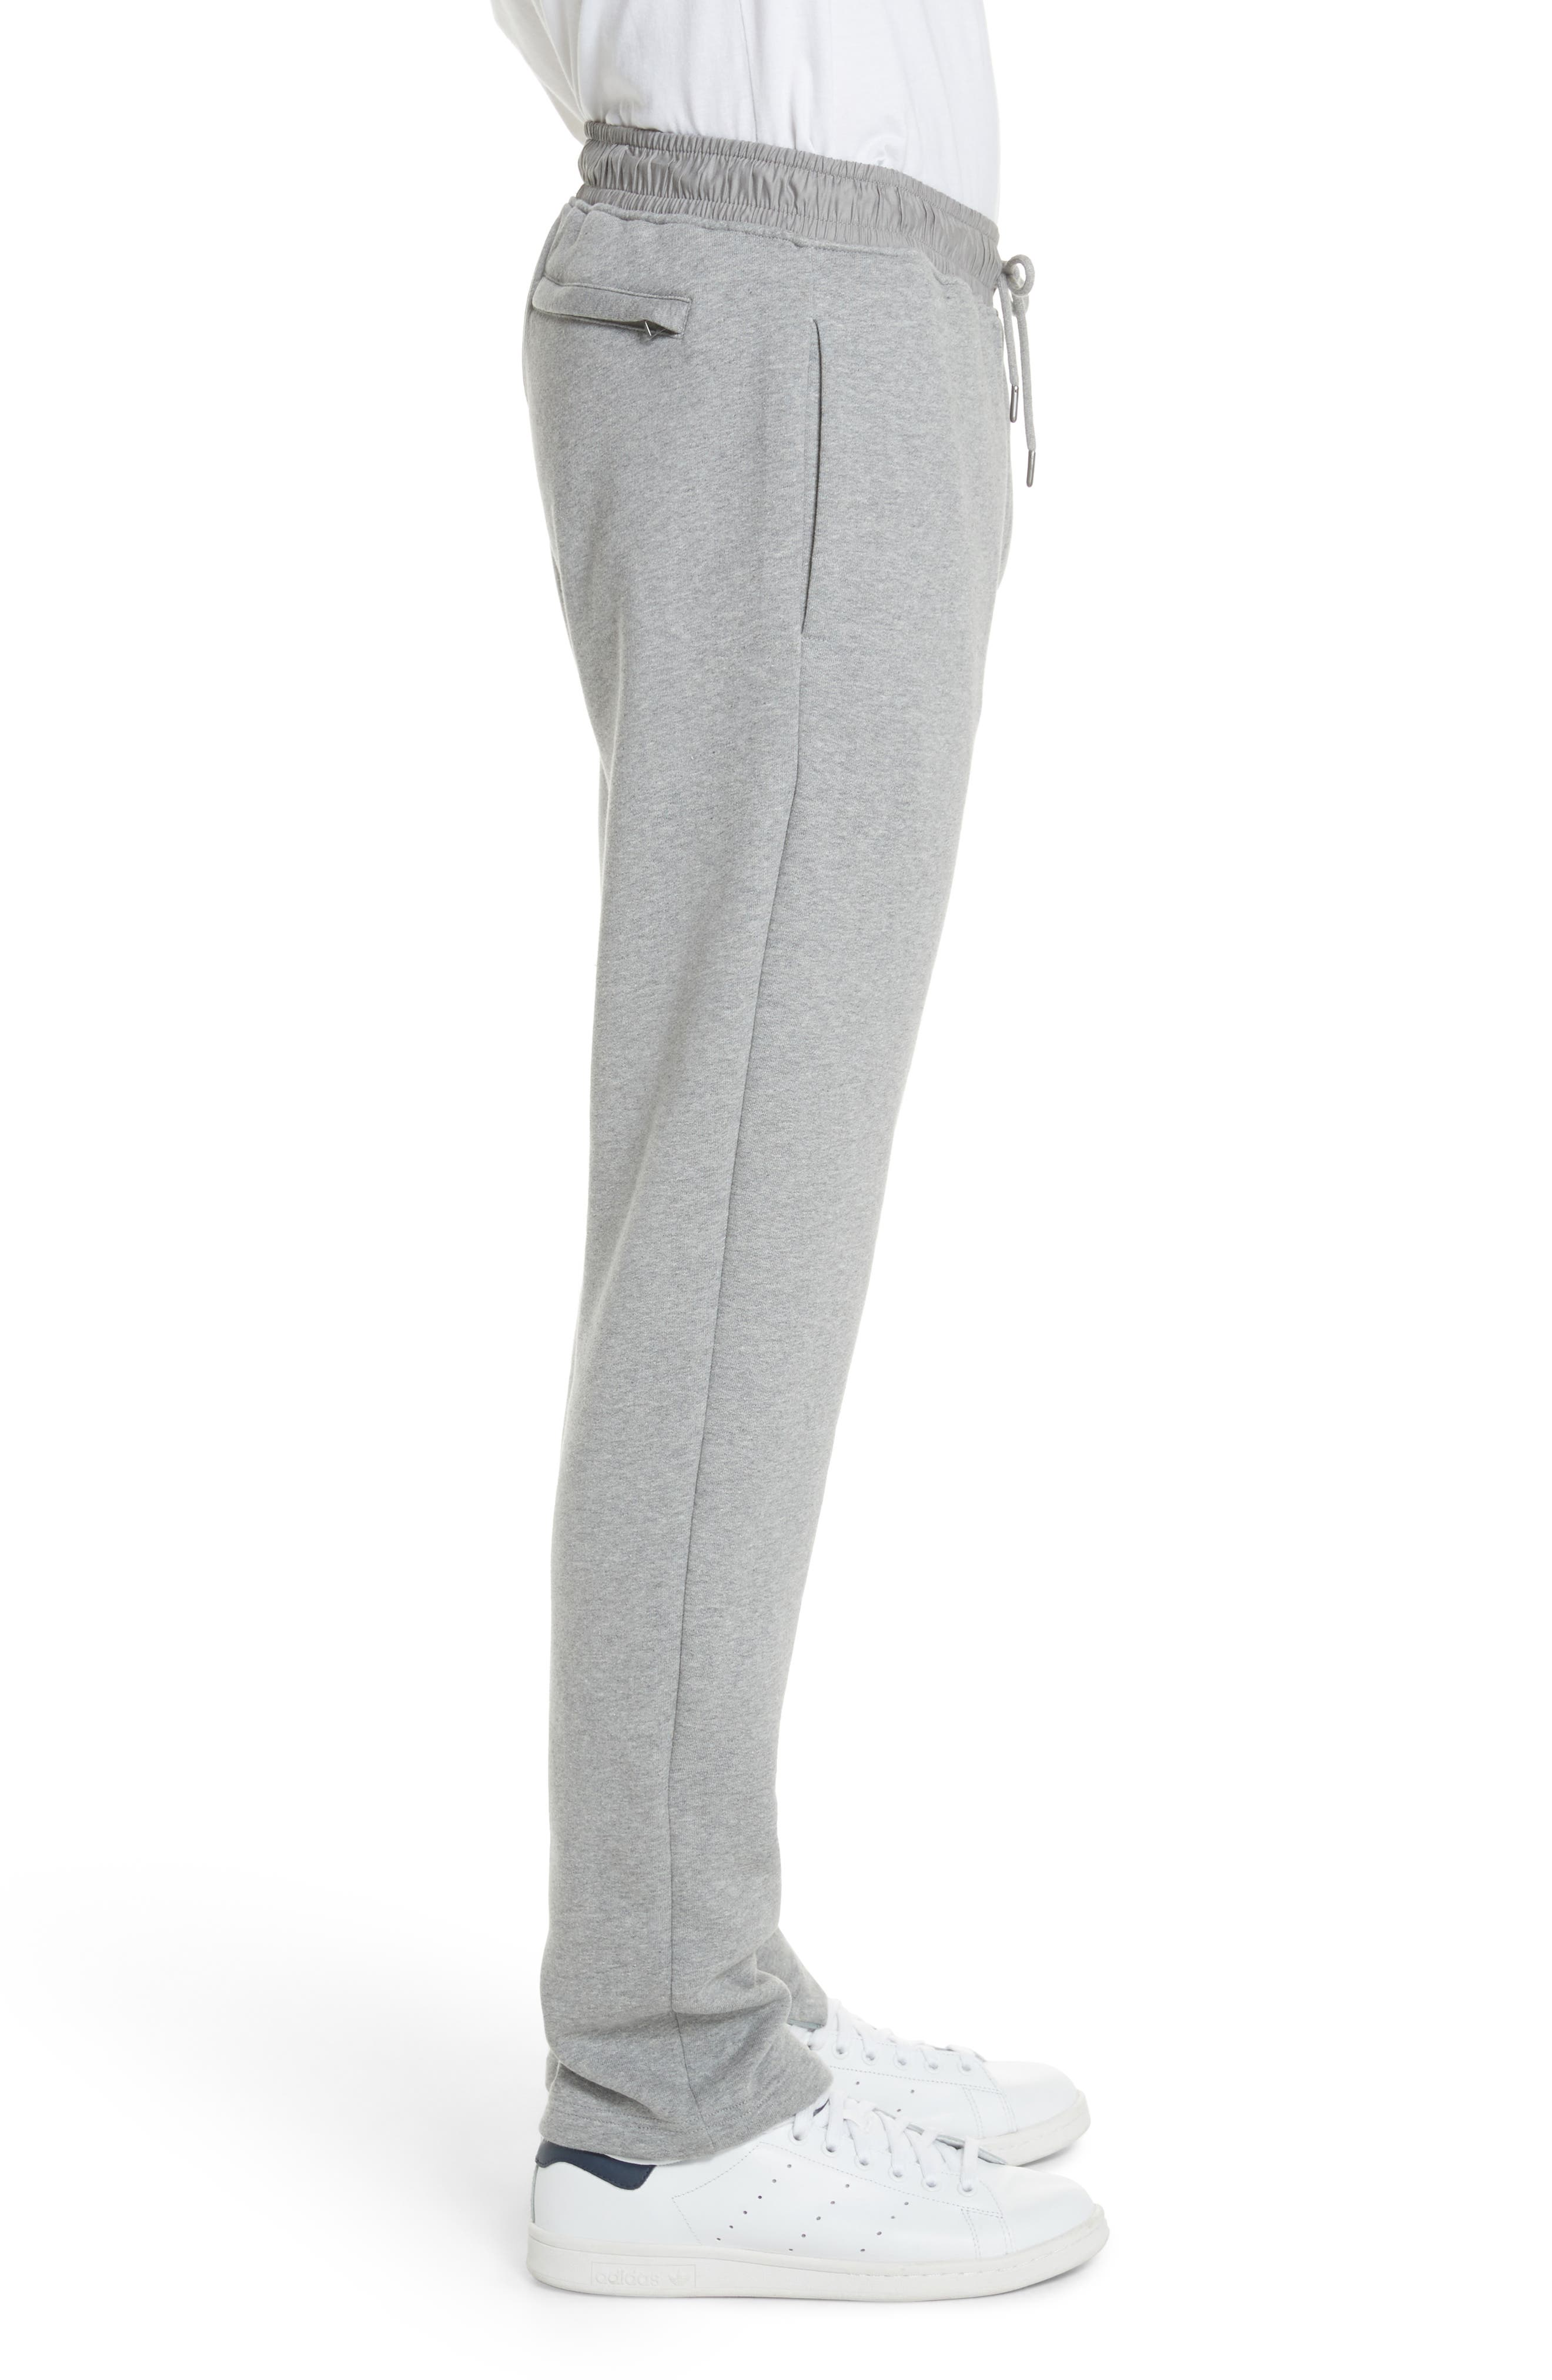 Nickford Lounge Pants,                             Alternate thumbnail 3, color,                             Pale Grey Melange